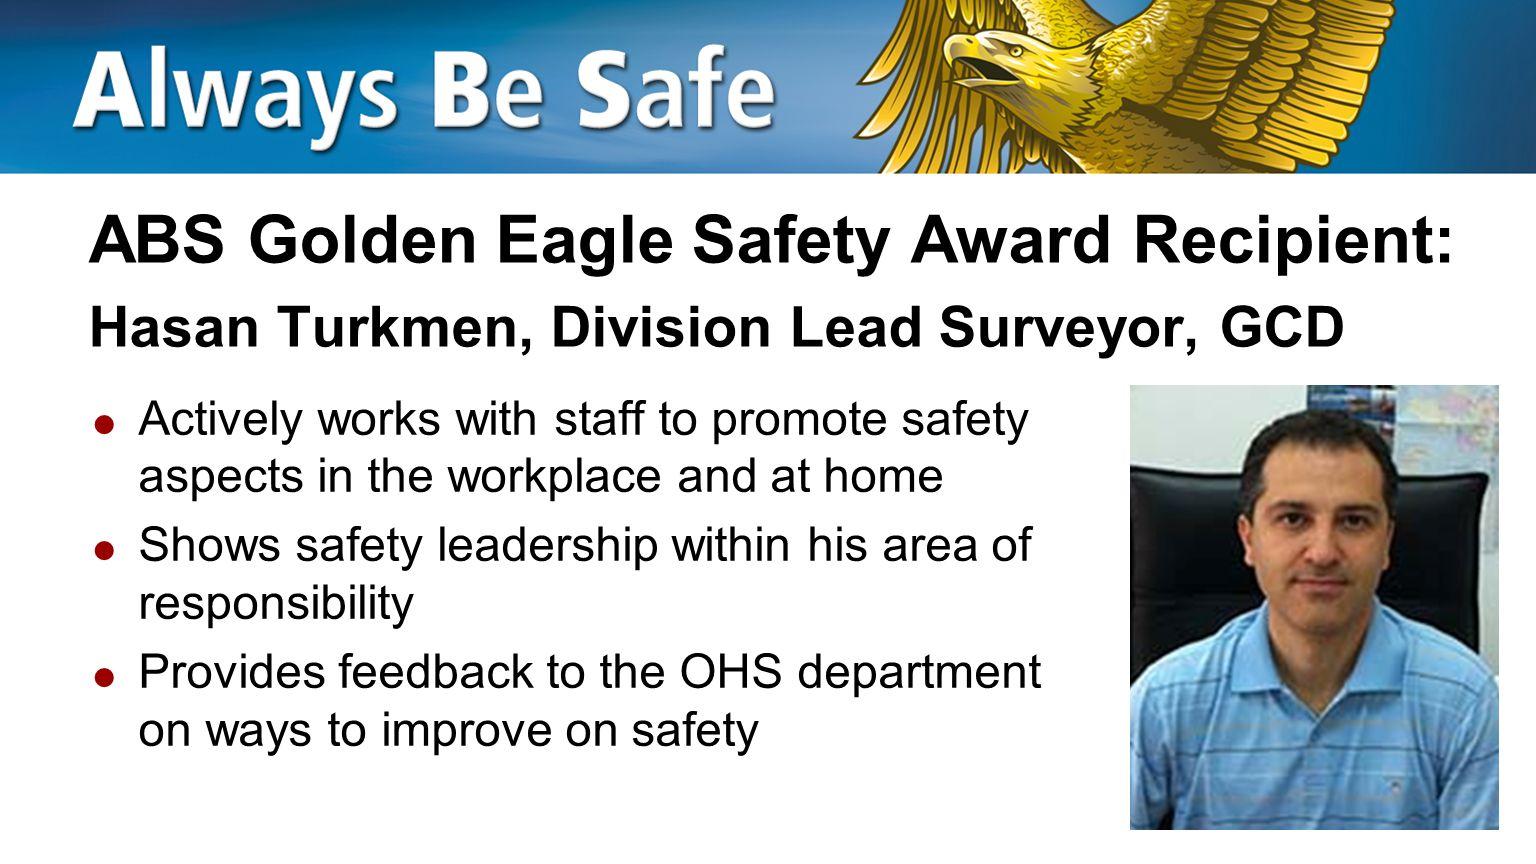 ABS Golden Eagle Safety Award Recipient: Hasan Turkmen, Division Lead Surveyor, GCD